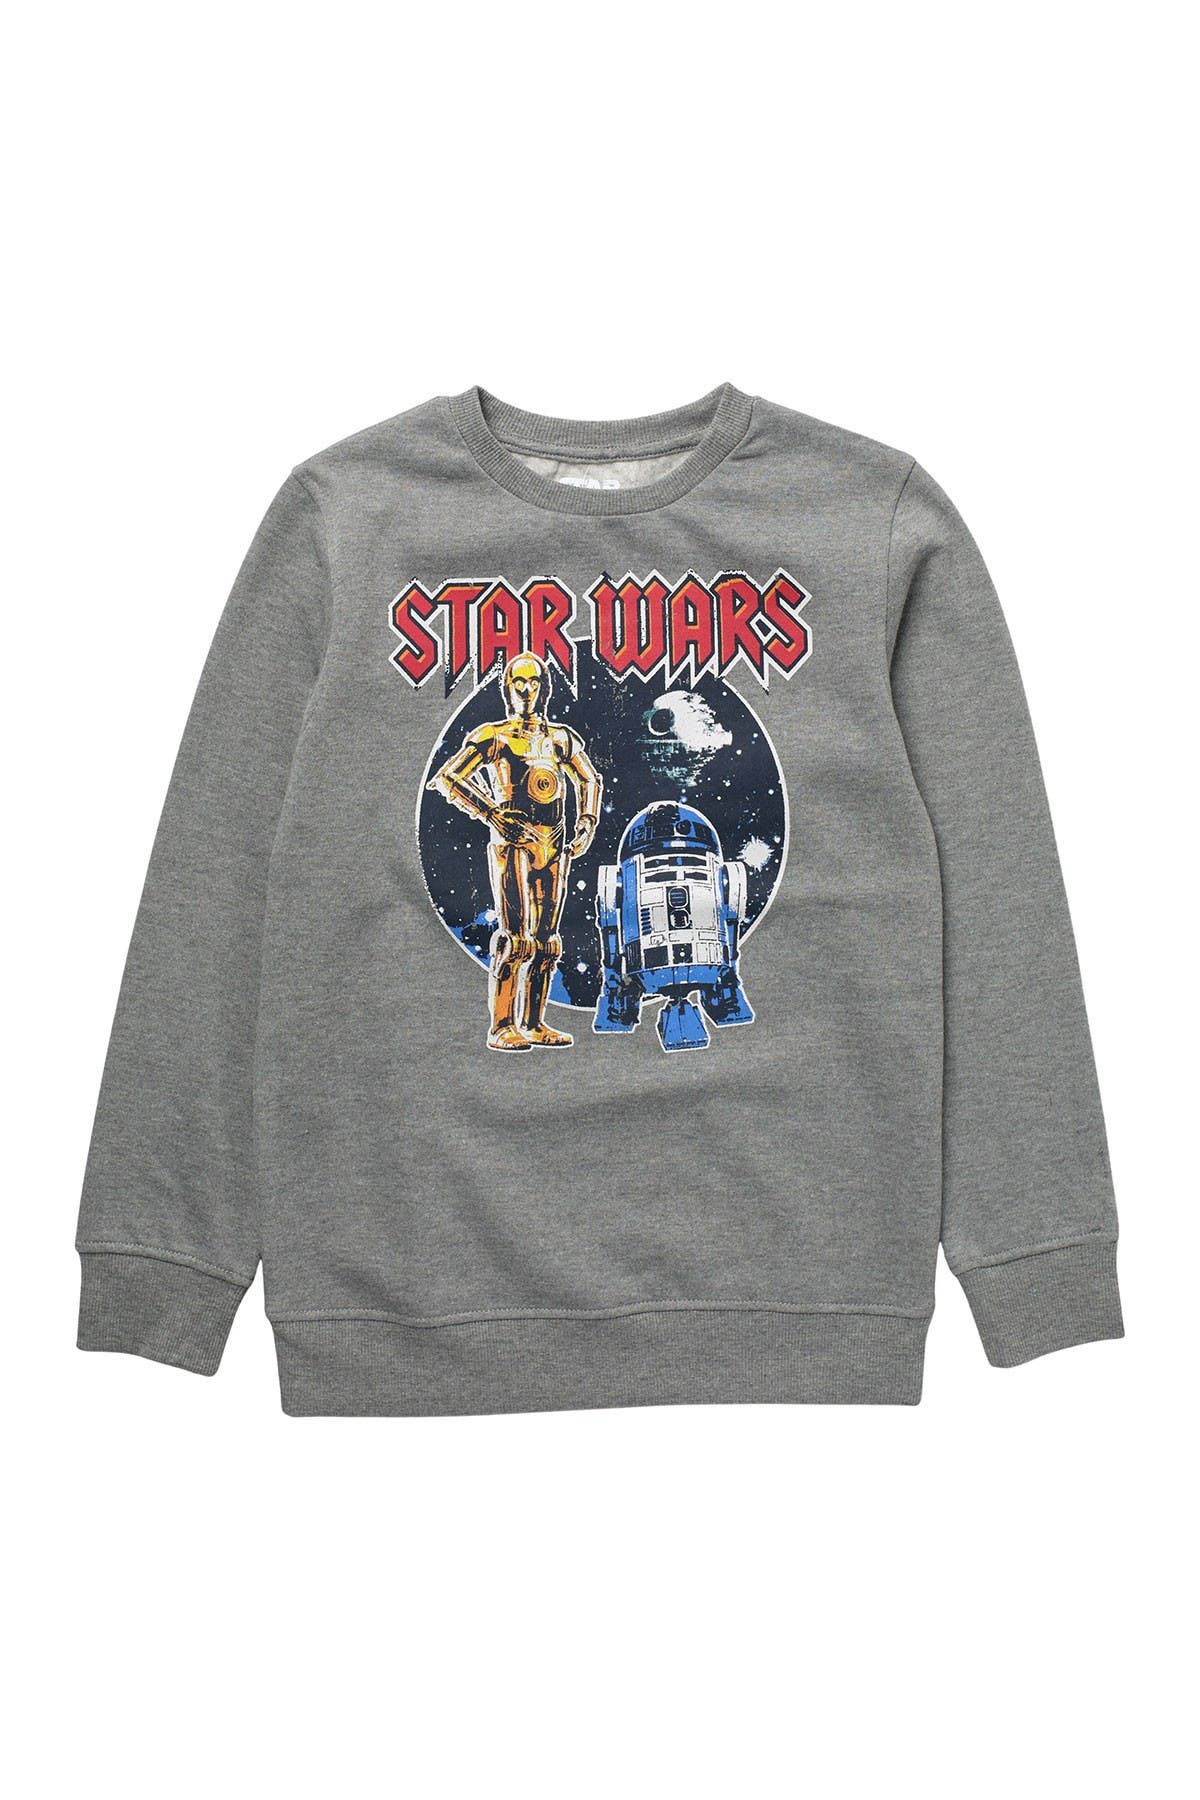 Image of JEM Star Wars Crewneck Sweatshirt